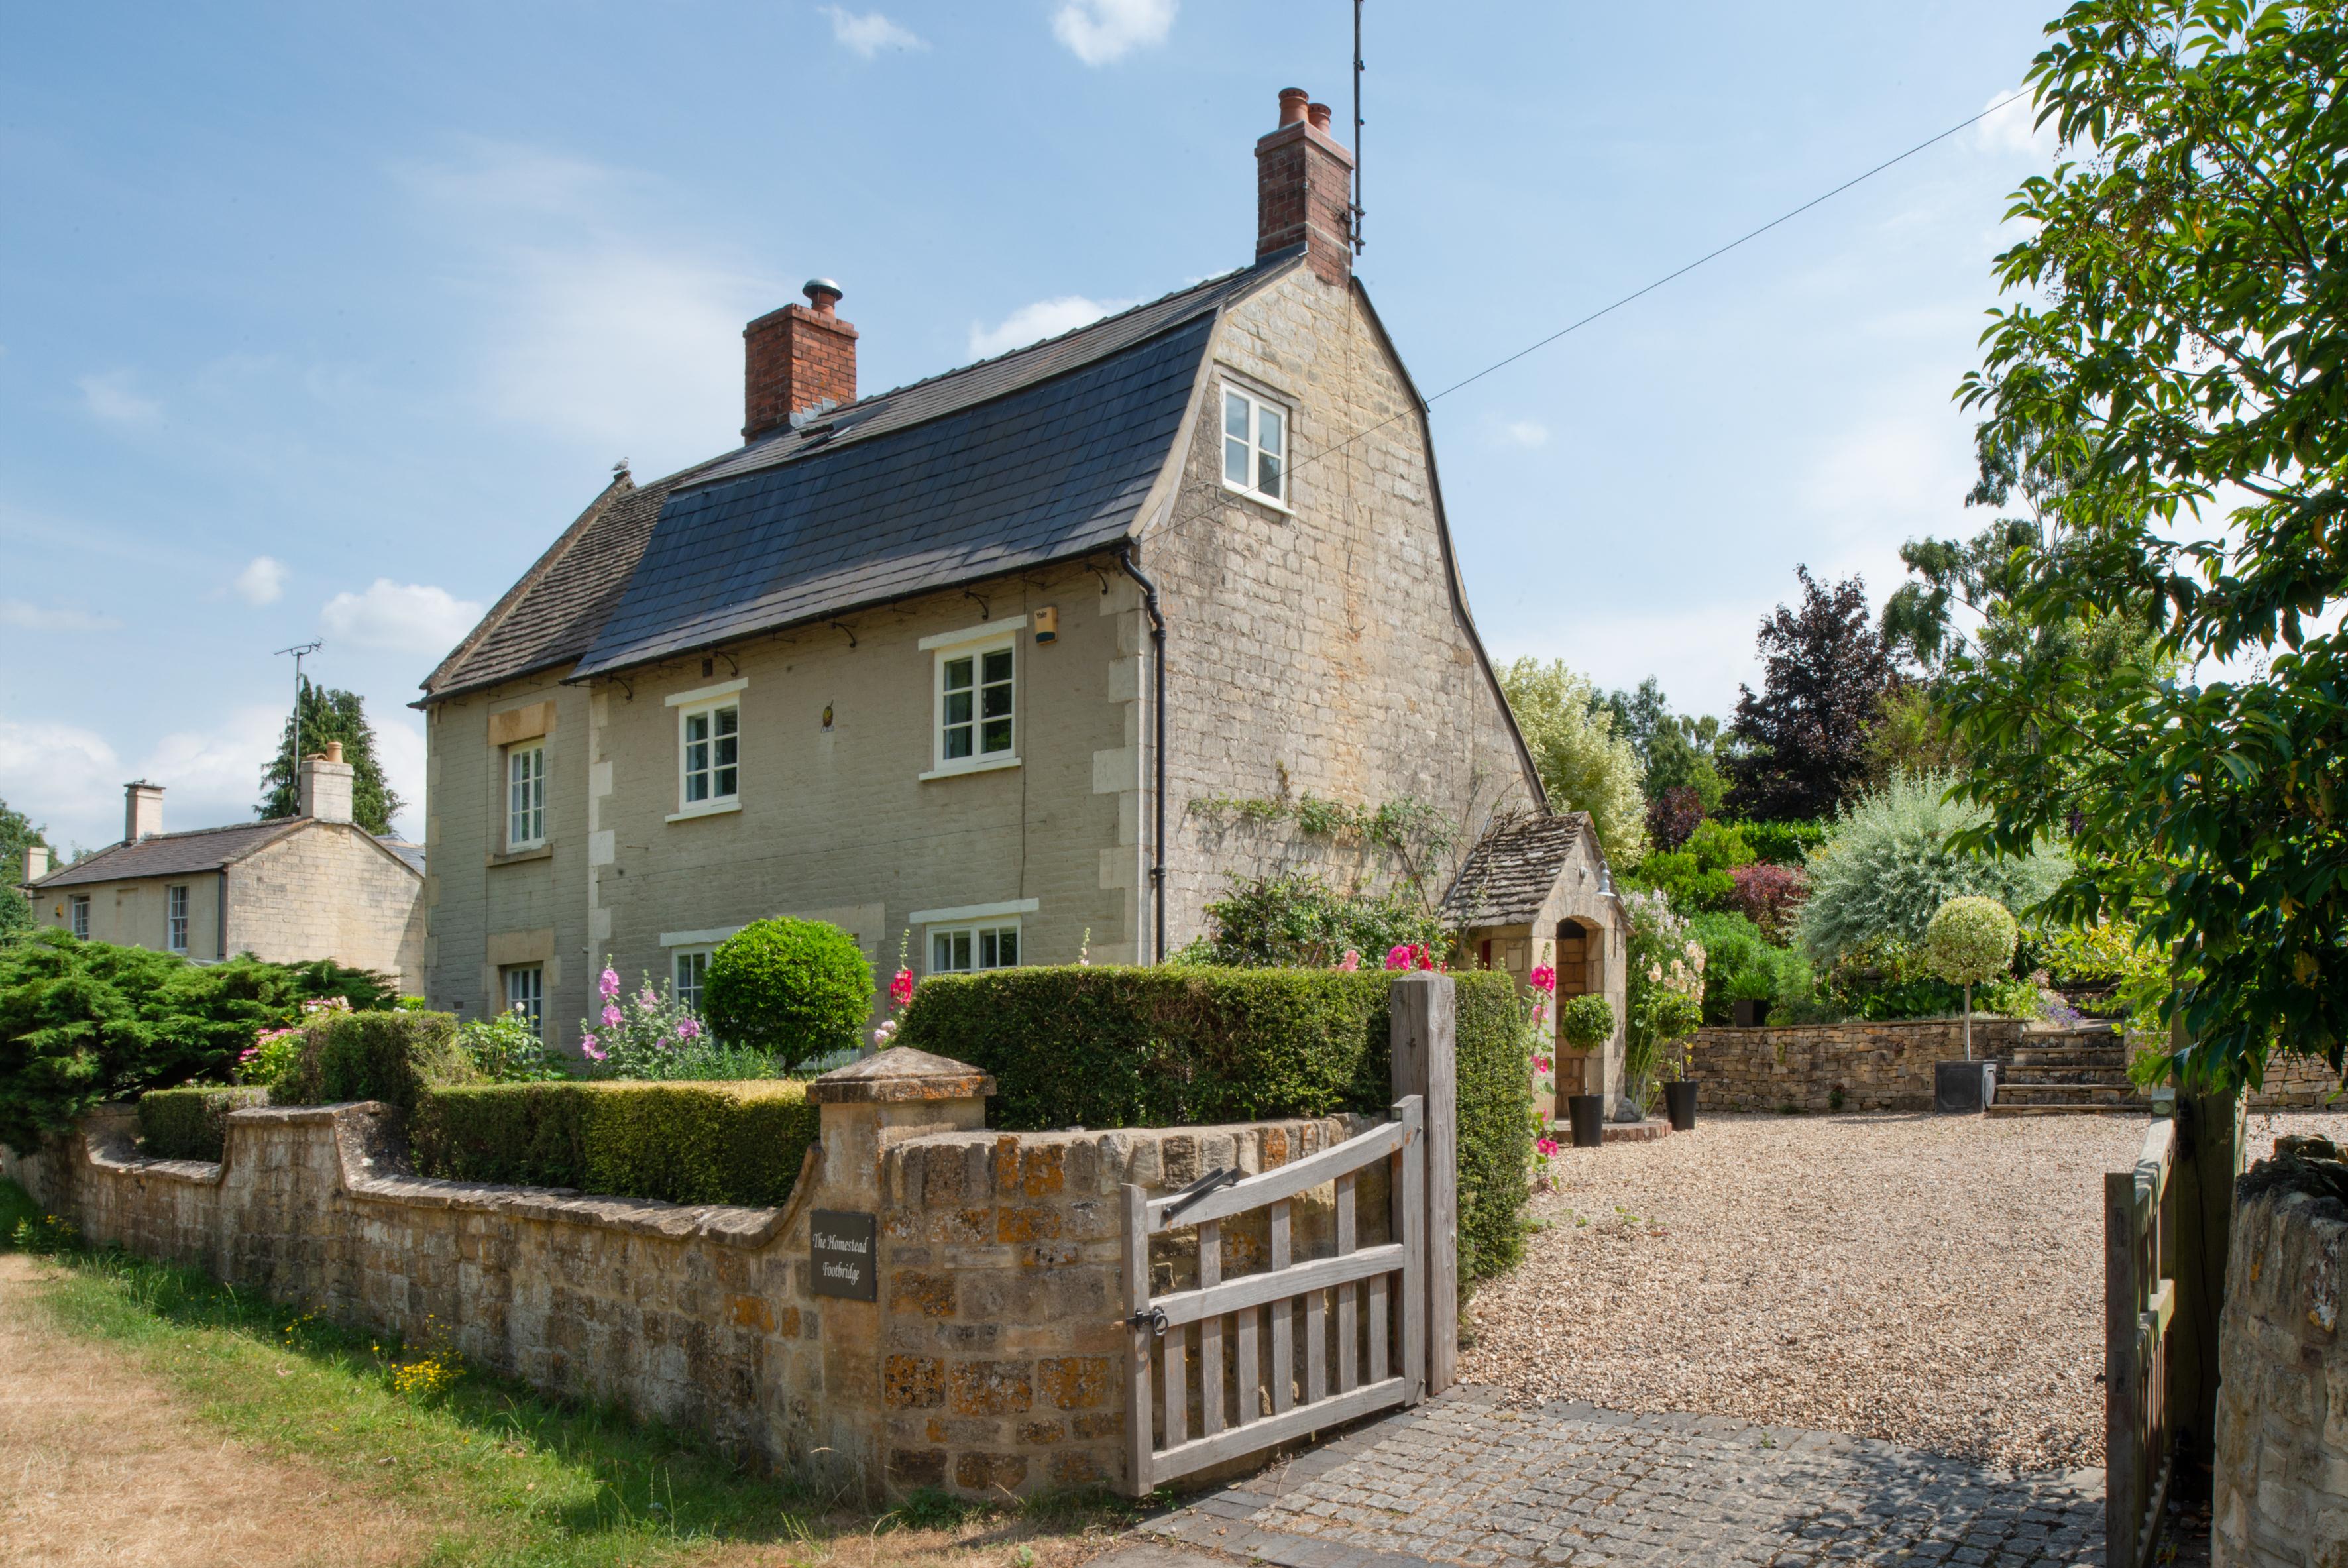 Footbridge Winchcombe Cheltenham Gl54 4 Bedroom Detached House Average Cost Of Rewiring A 5 For Sale 48500837 Primelocation